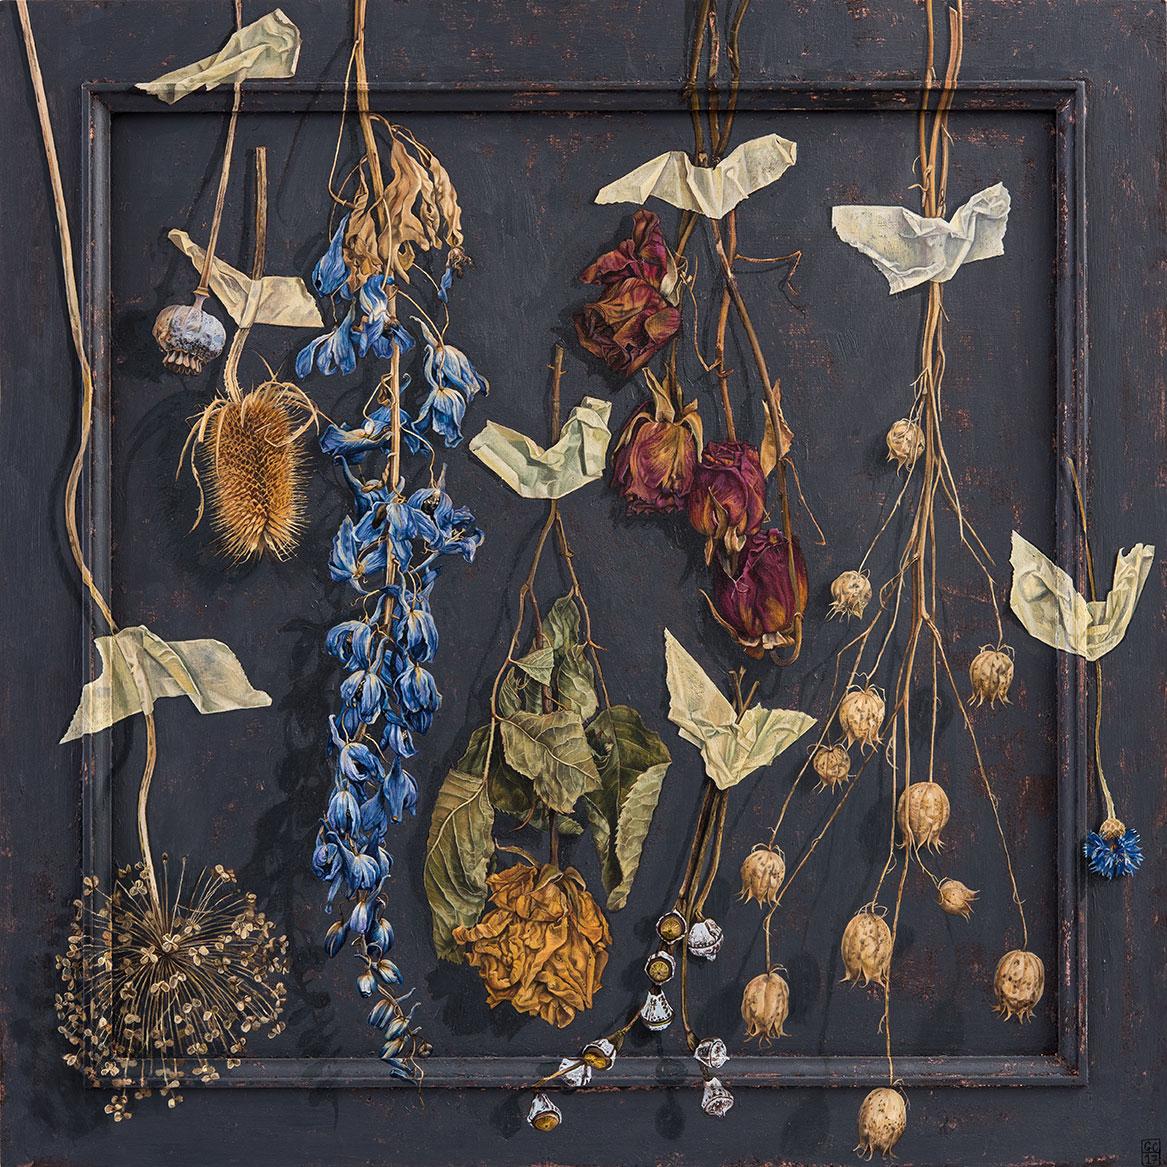 'Masked' Oil and Copper Leaf on Panel, 54cm x 54cm, 2017 SOLD